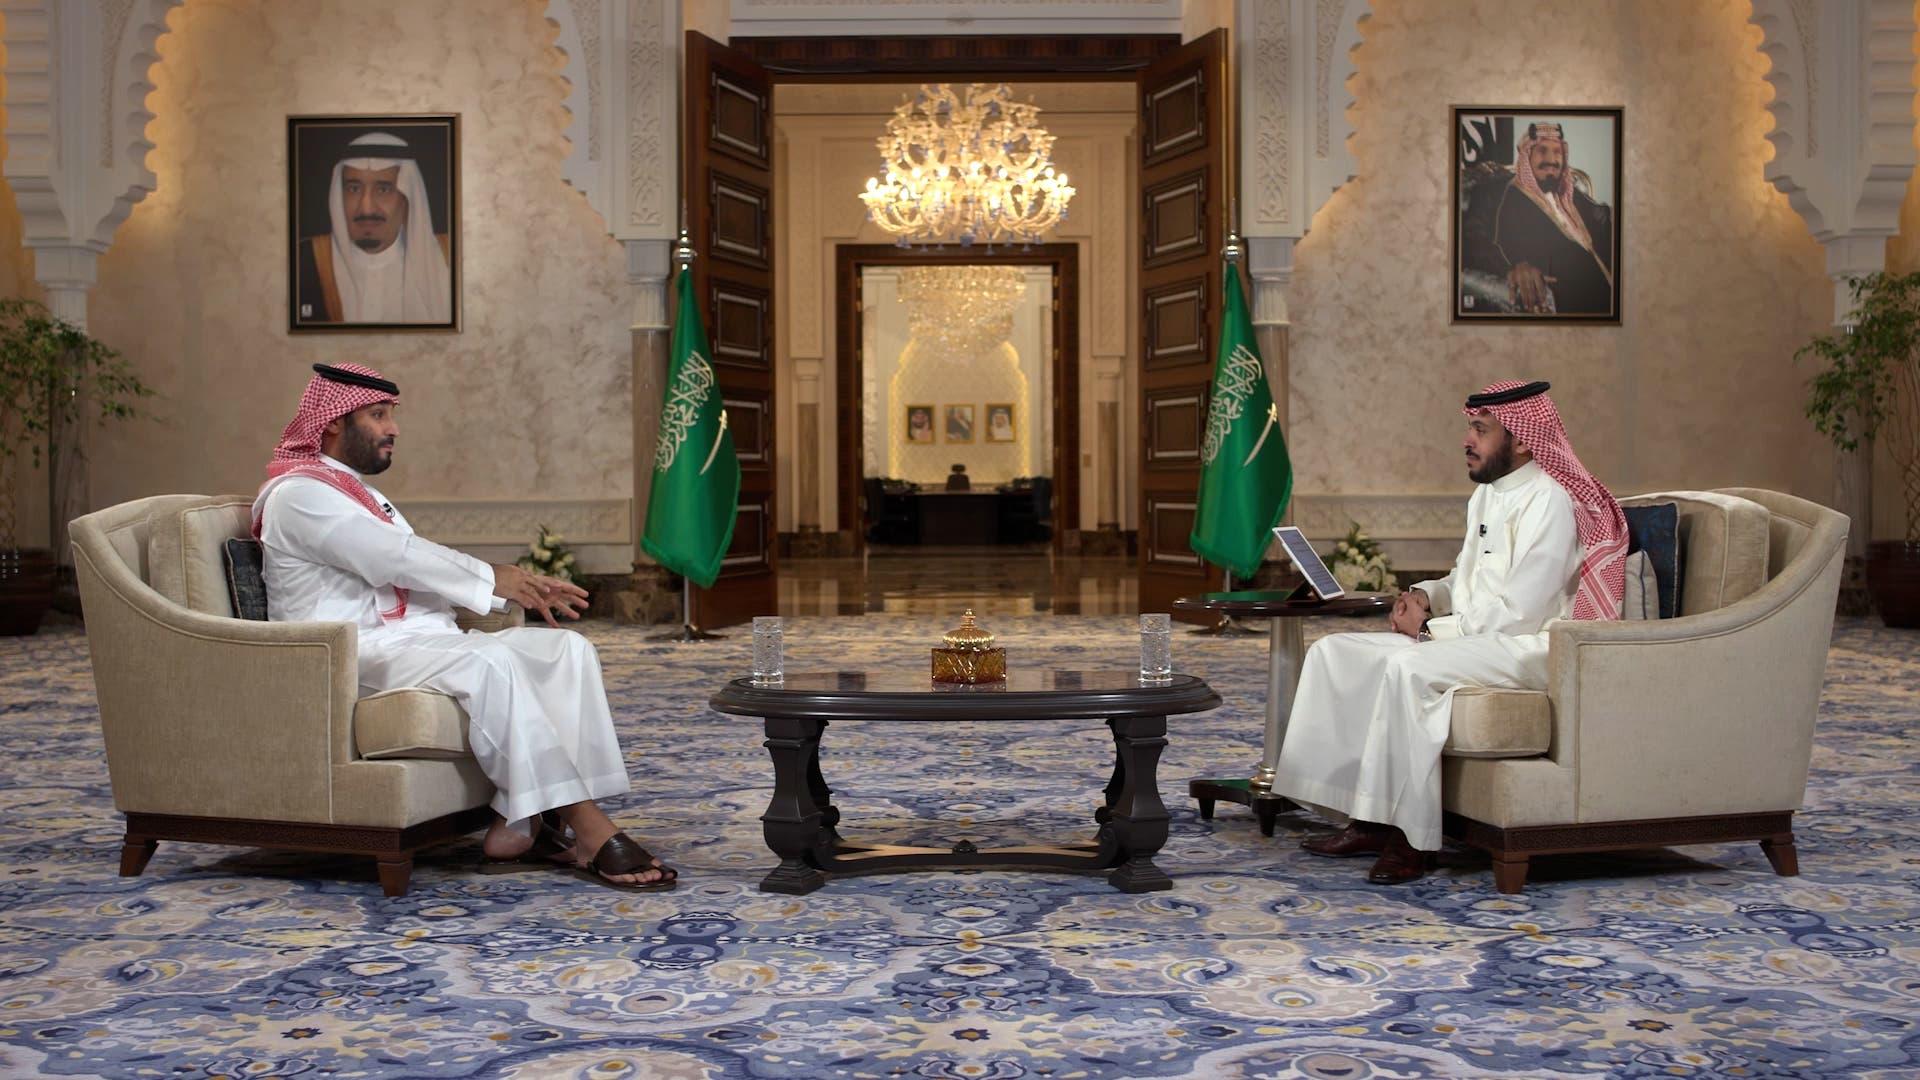 Saudi Arabia's Crown Prince Mohammed bin Salman during the interview. (Screengrab)